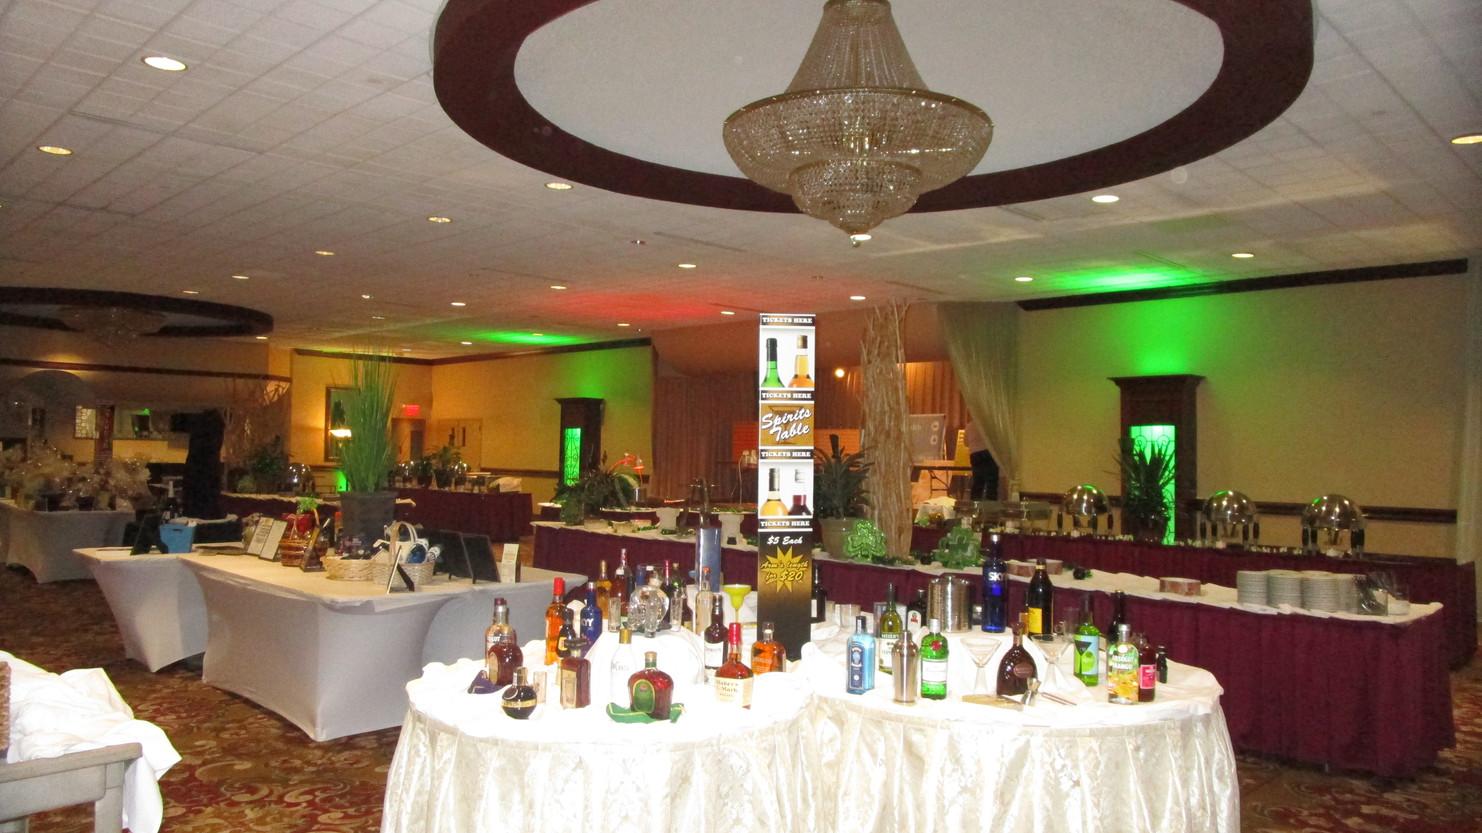 LaMalfa Party Center